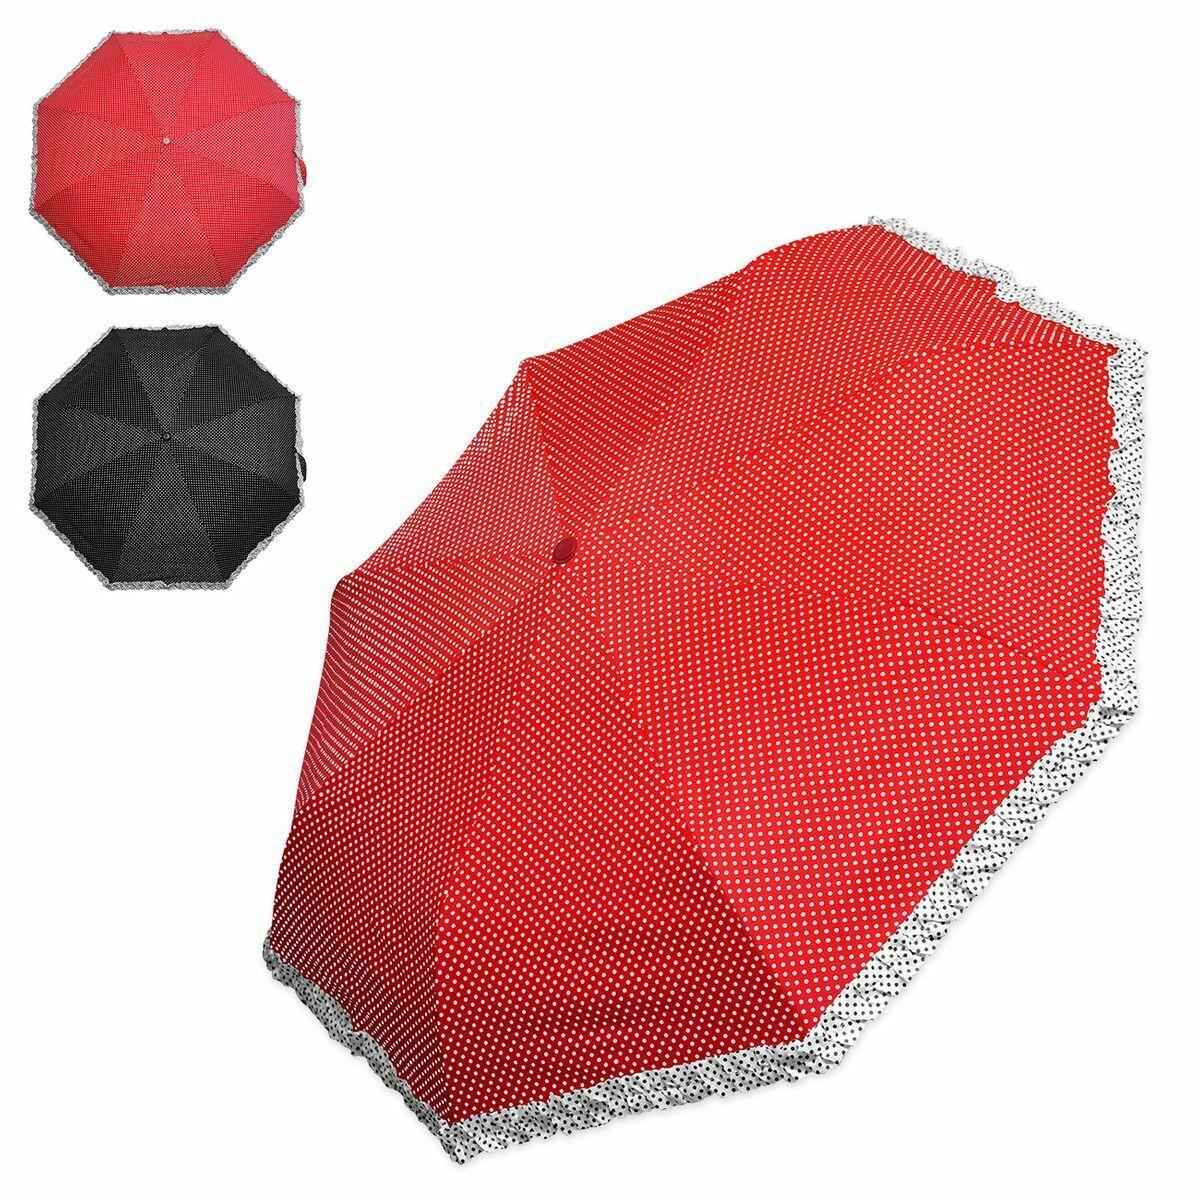 Pockets Umbrella Spotted Frill Edge Black Red Polka Dots Small Foldable